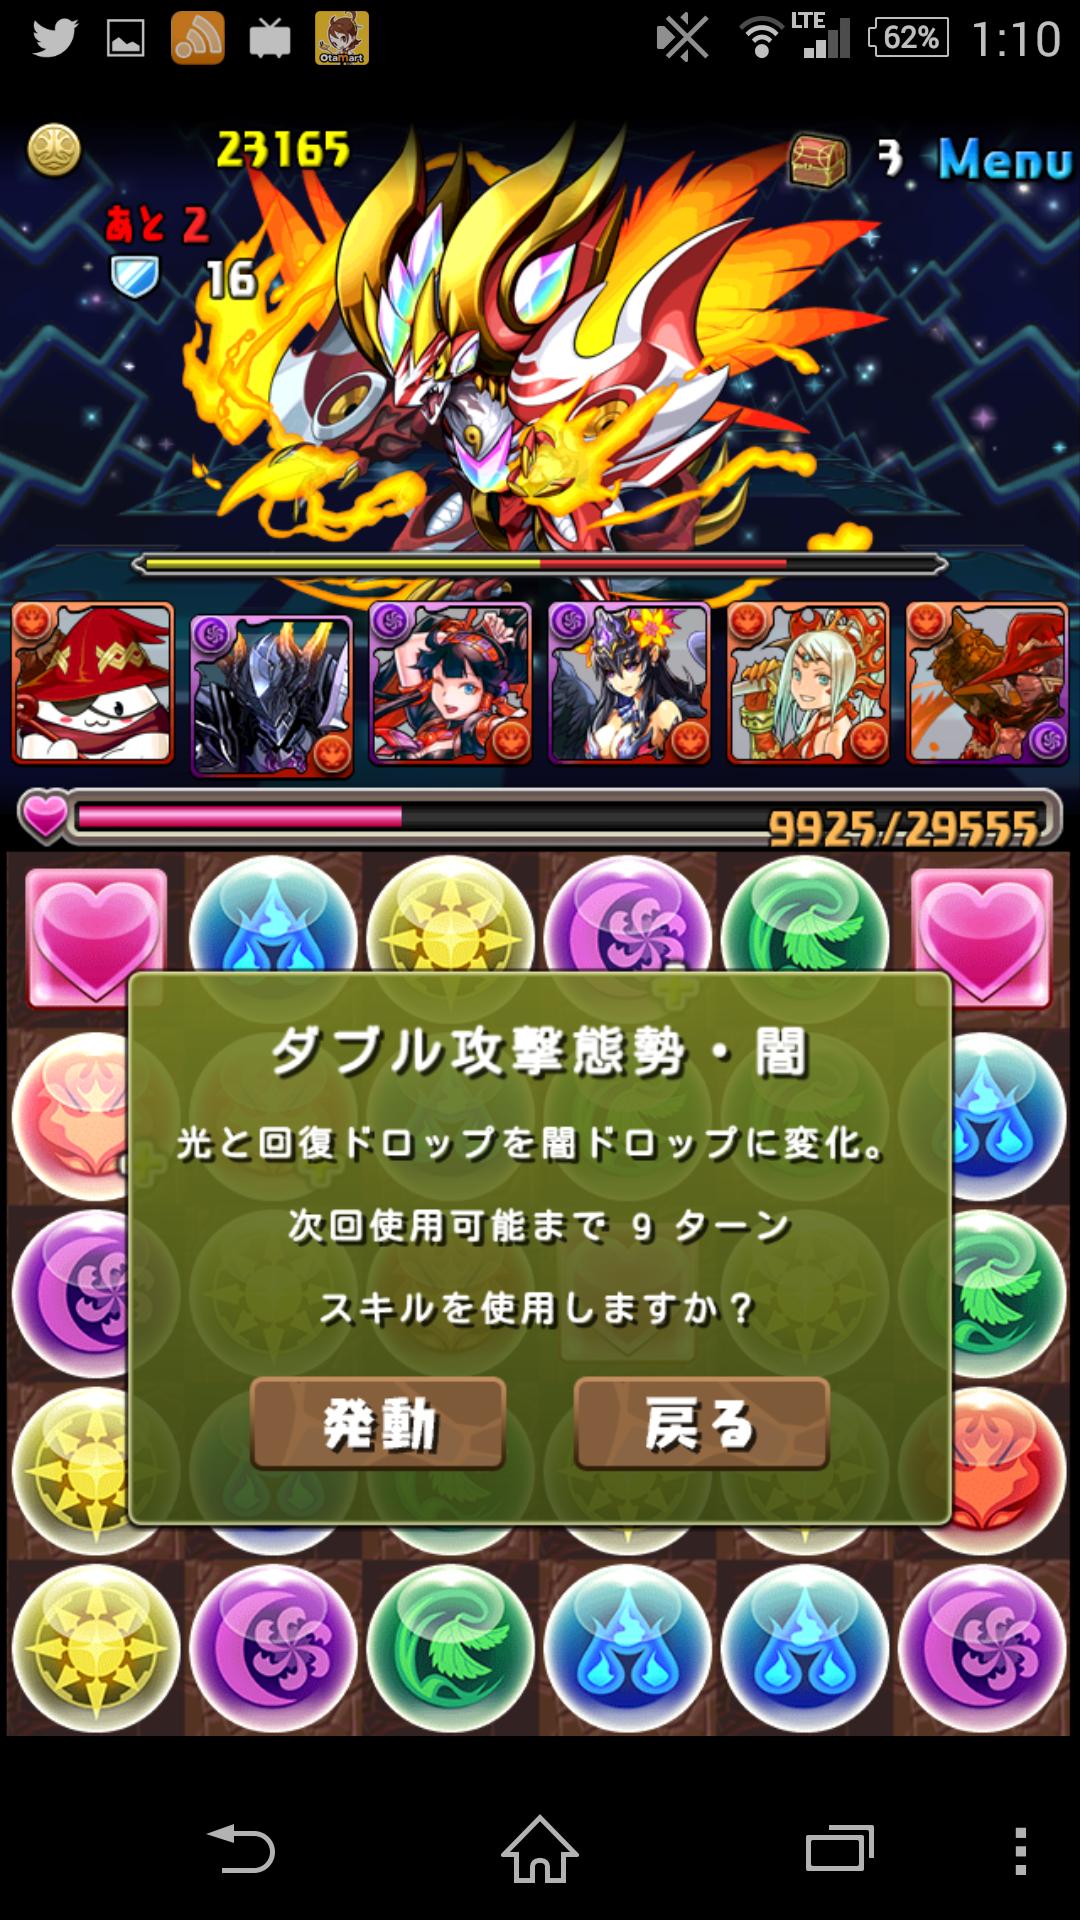 Screenshot_2015-03-18-01-10-09.png